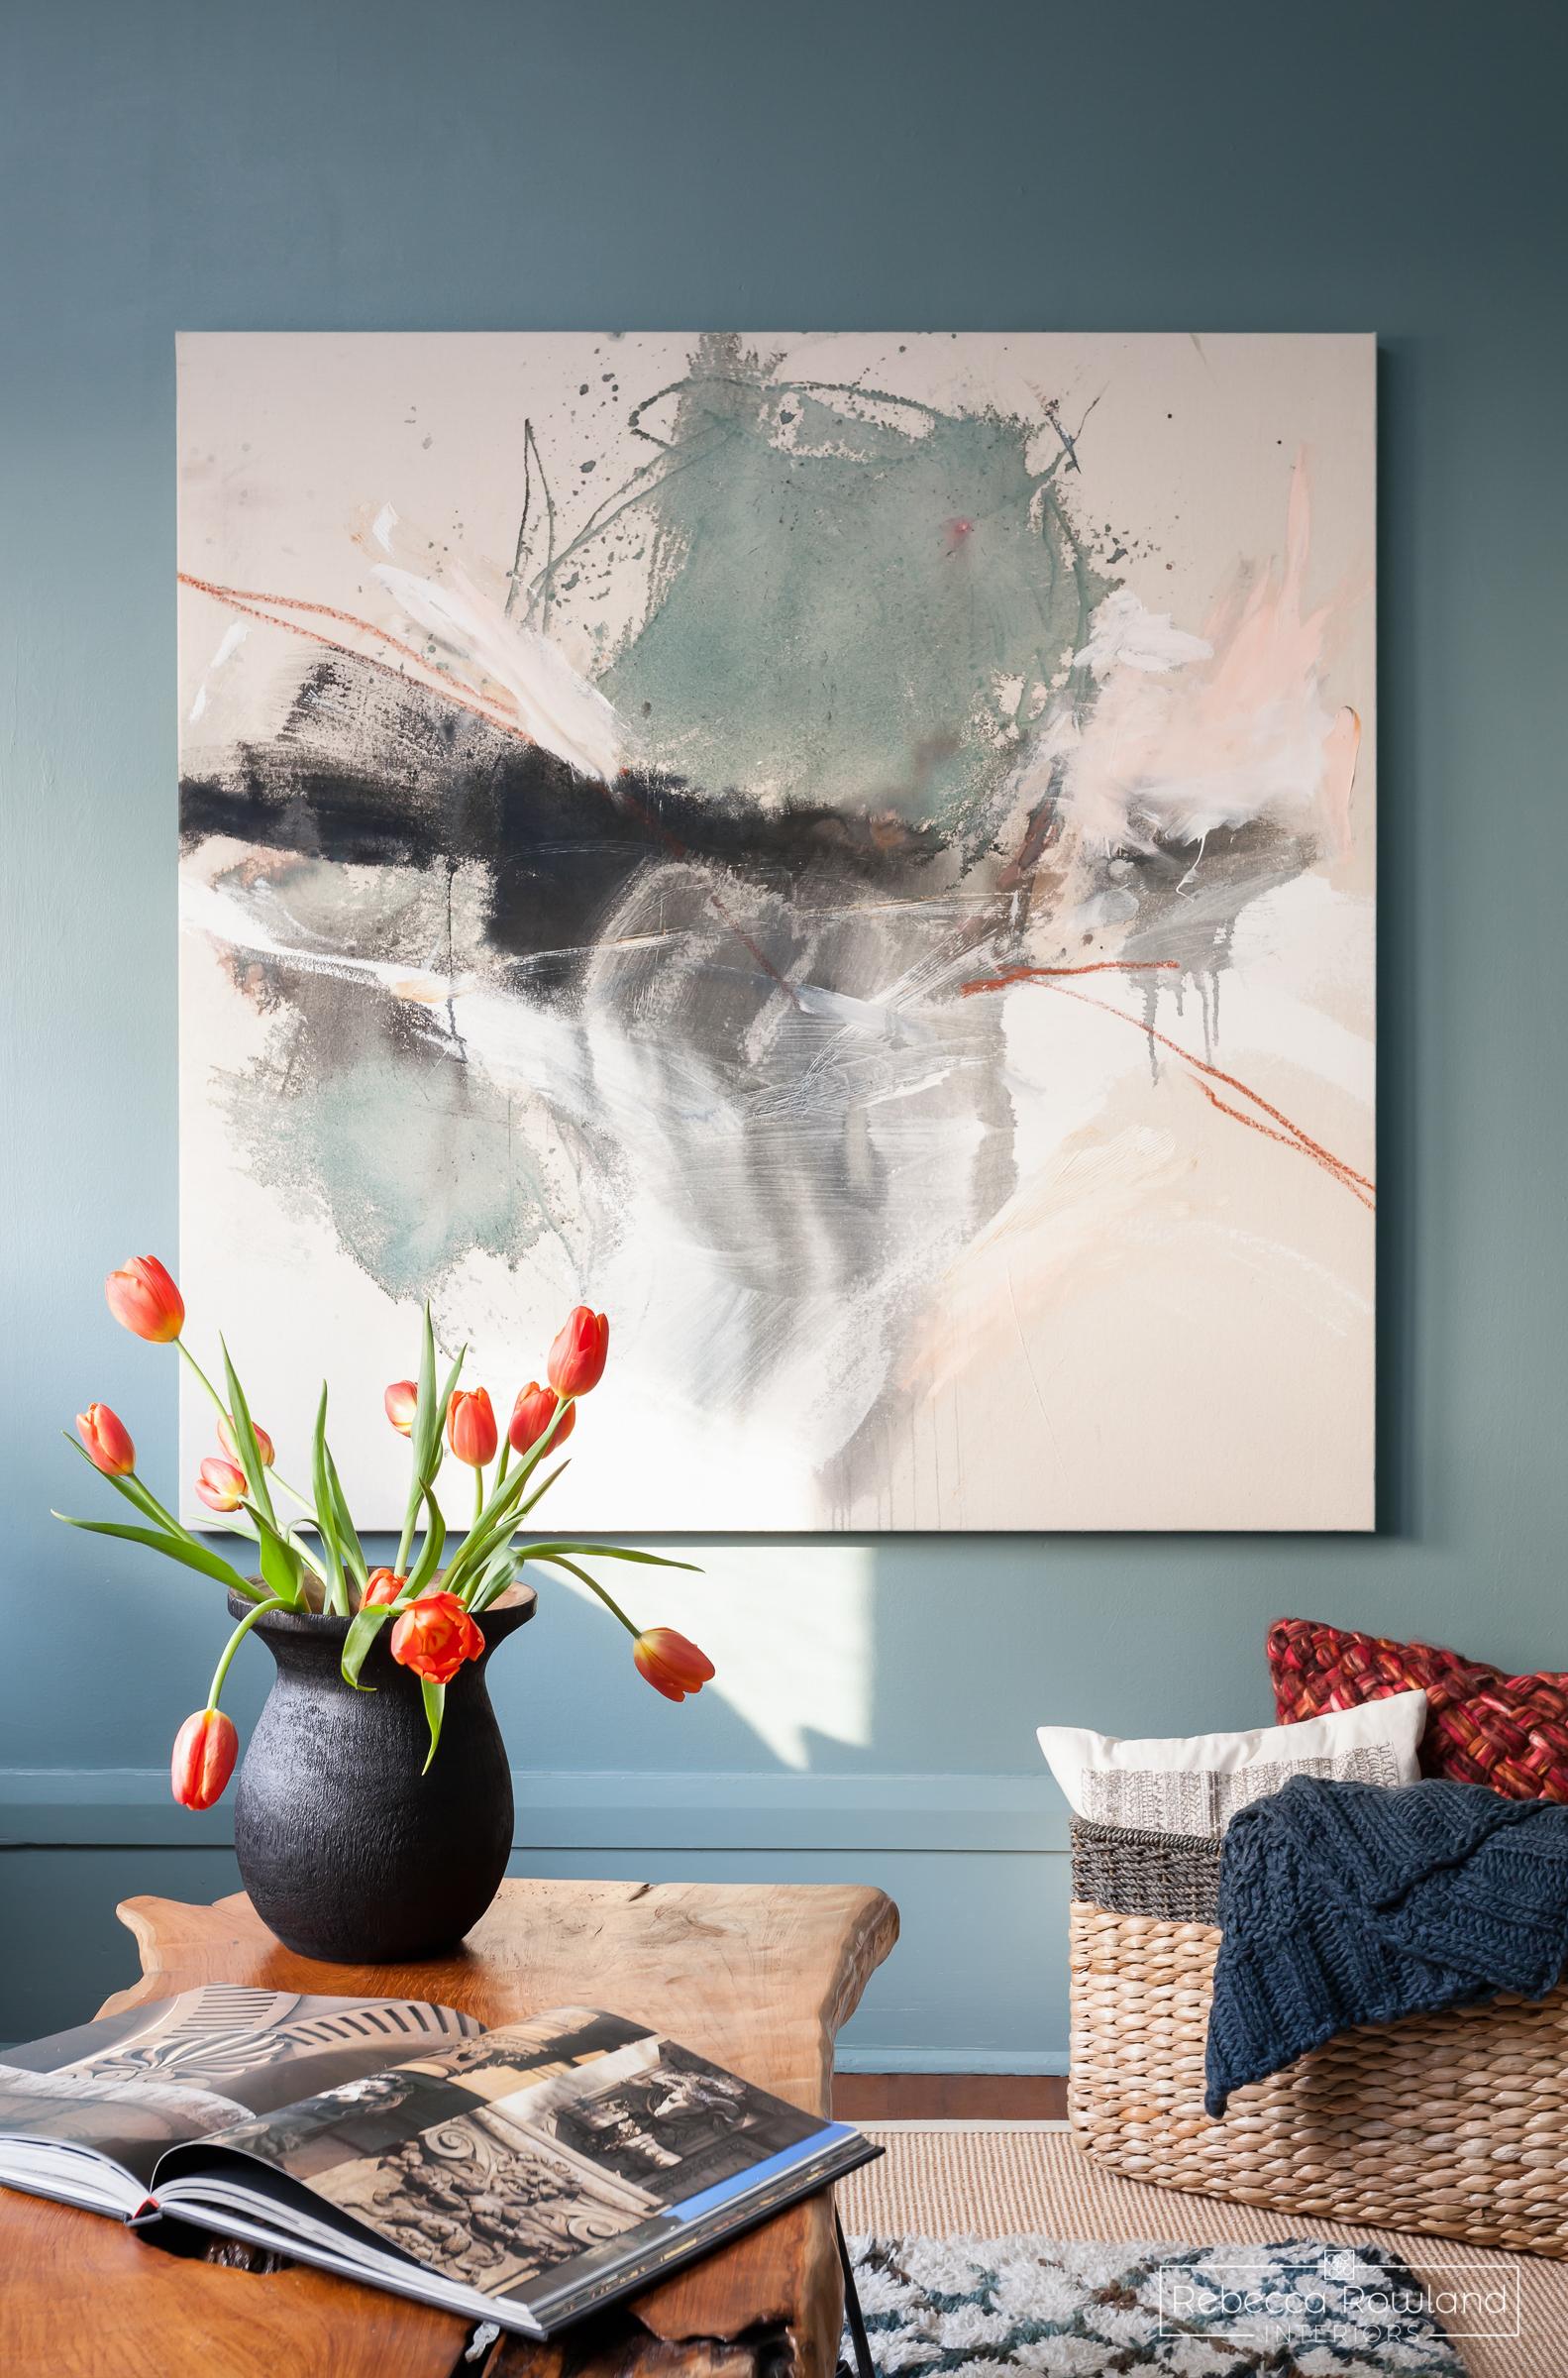 Rebecca Rowland Interiors _Roosevelt_Craftsman_seattle_interior_design_cozy_den_decor_painting_orange tulips